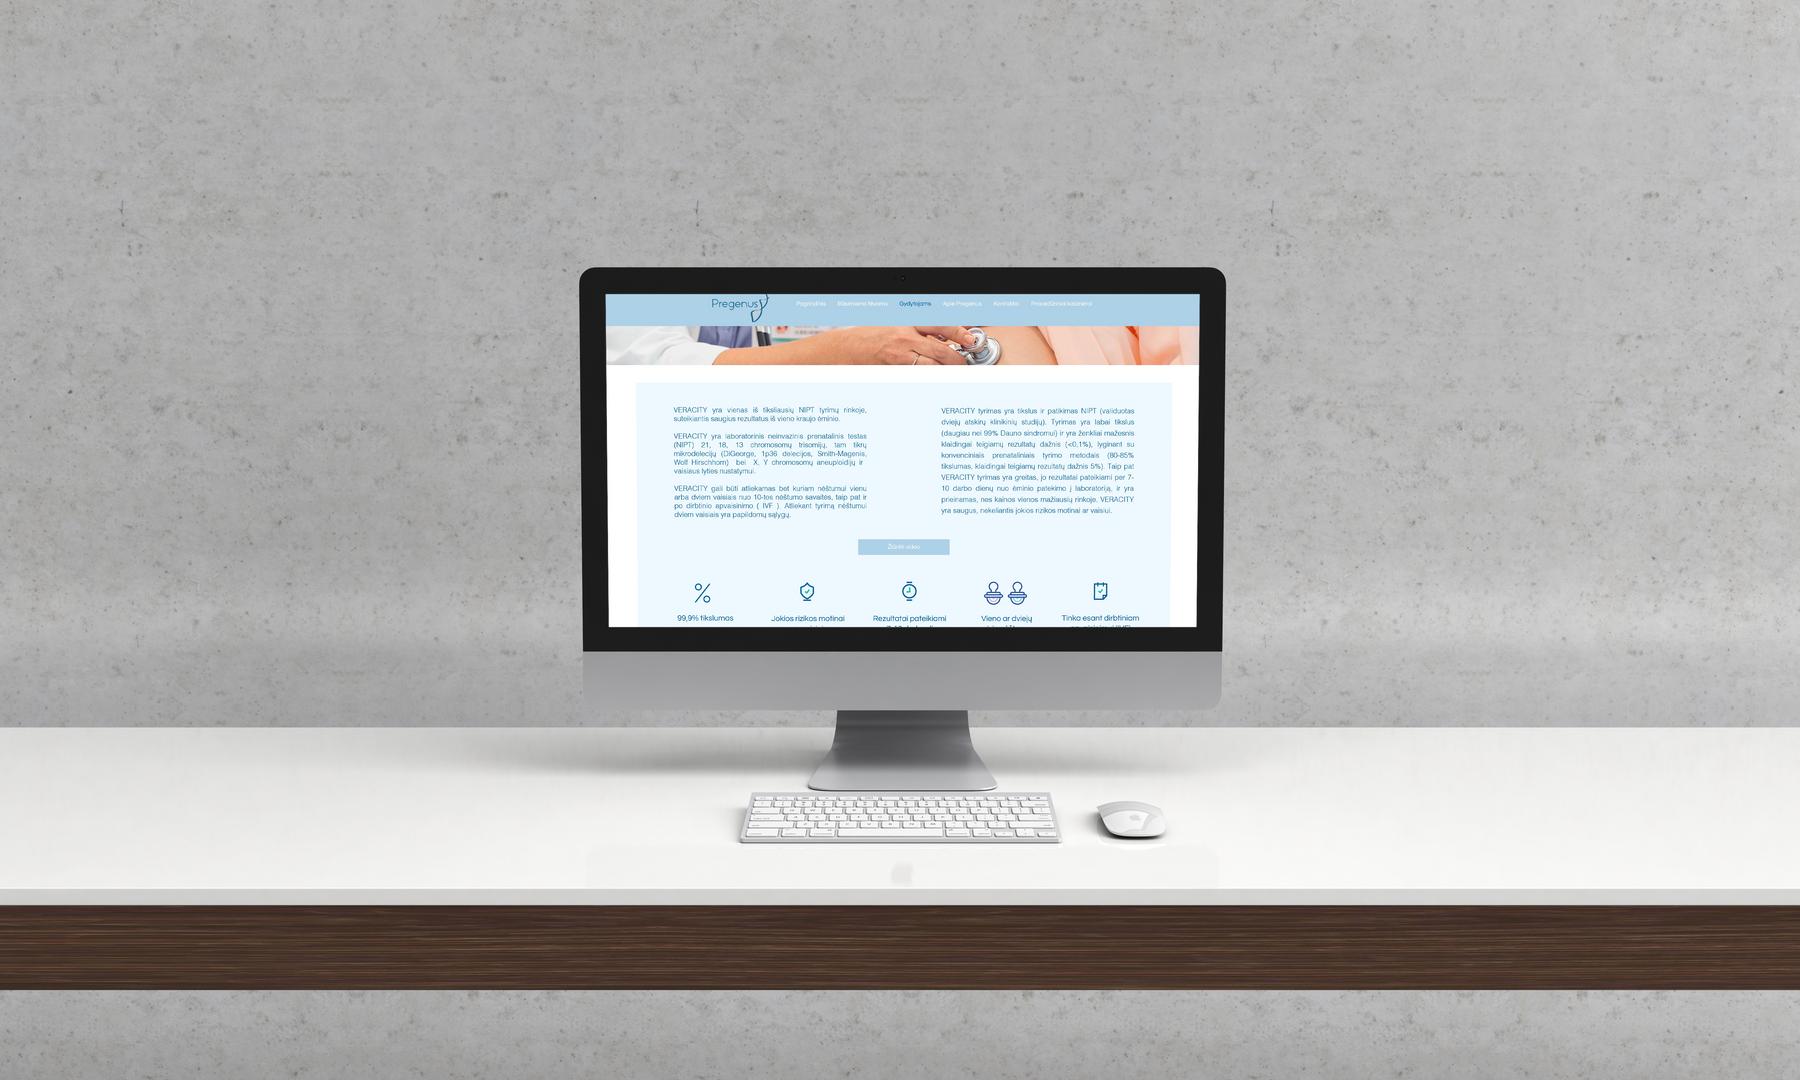 Pregenus website